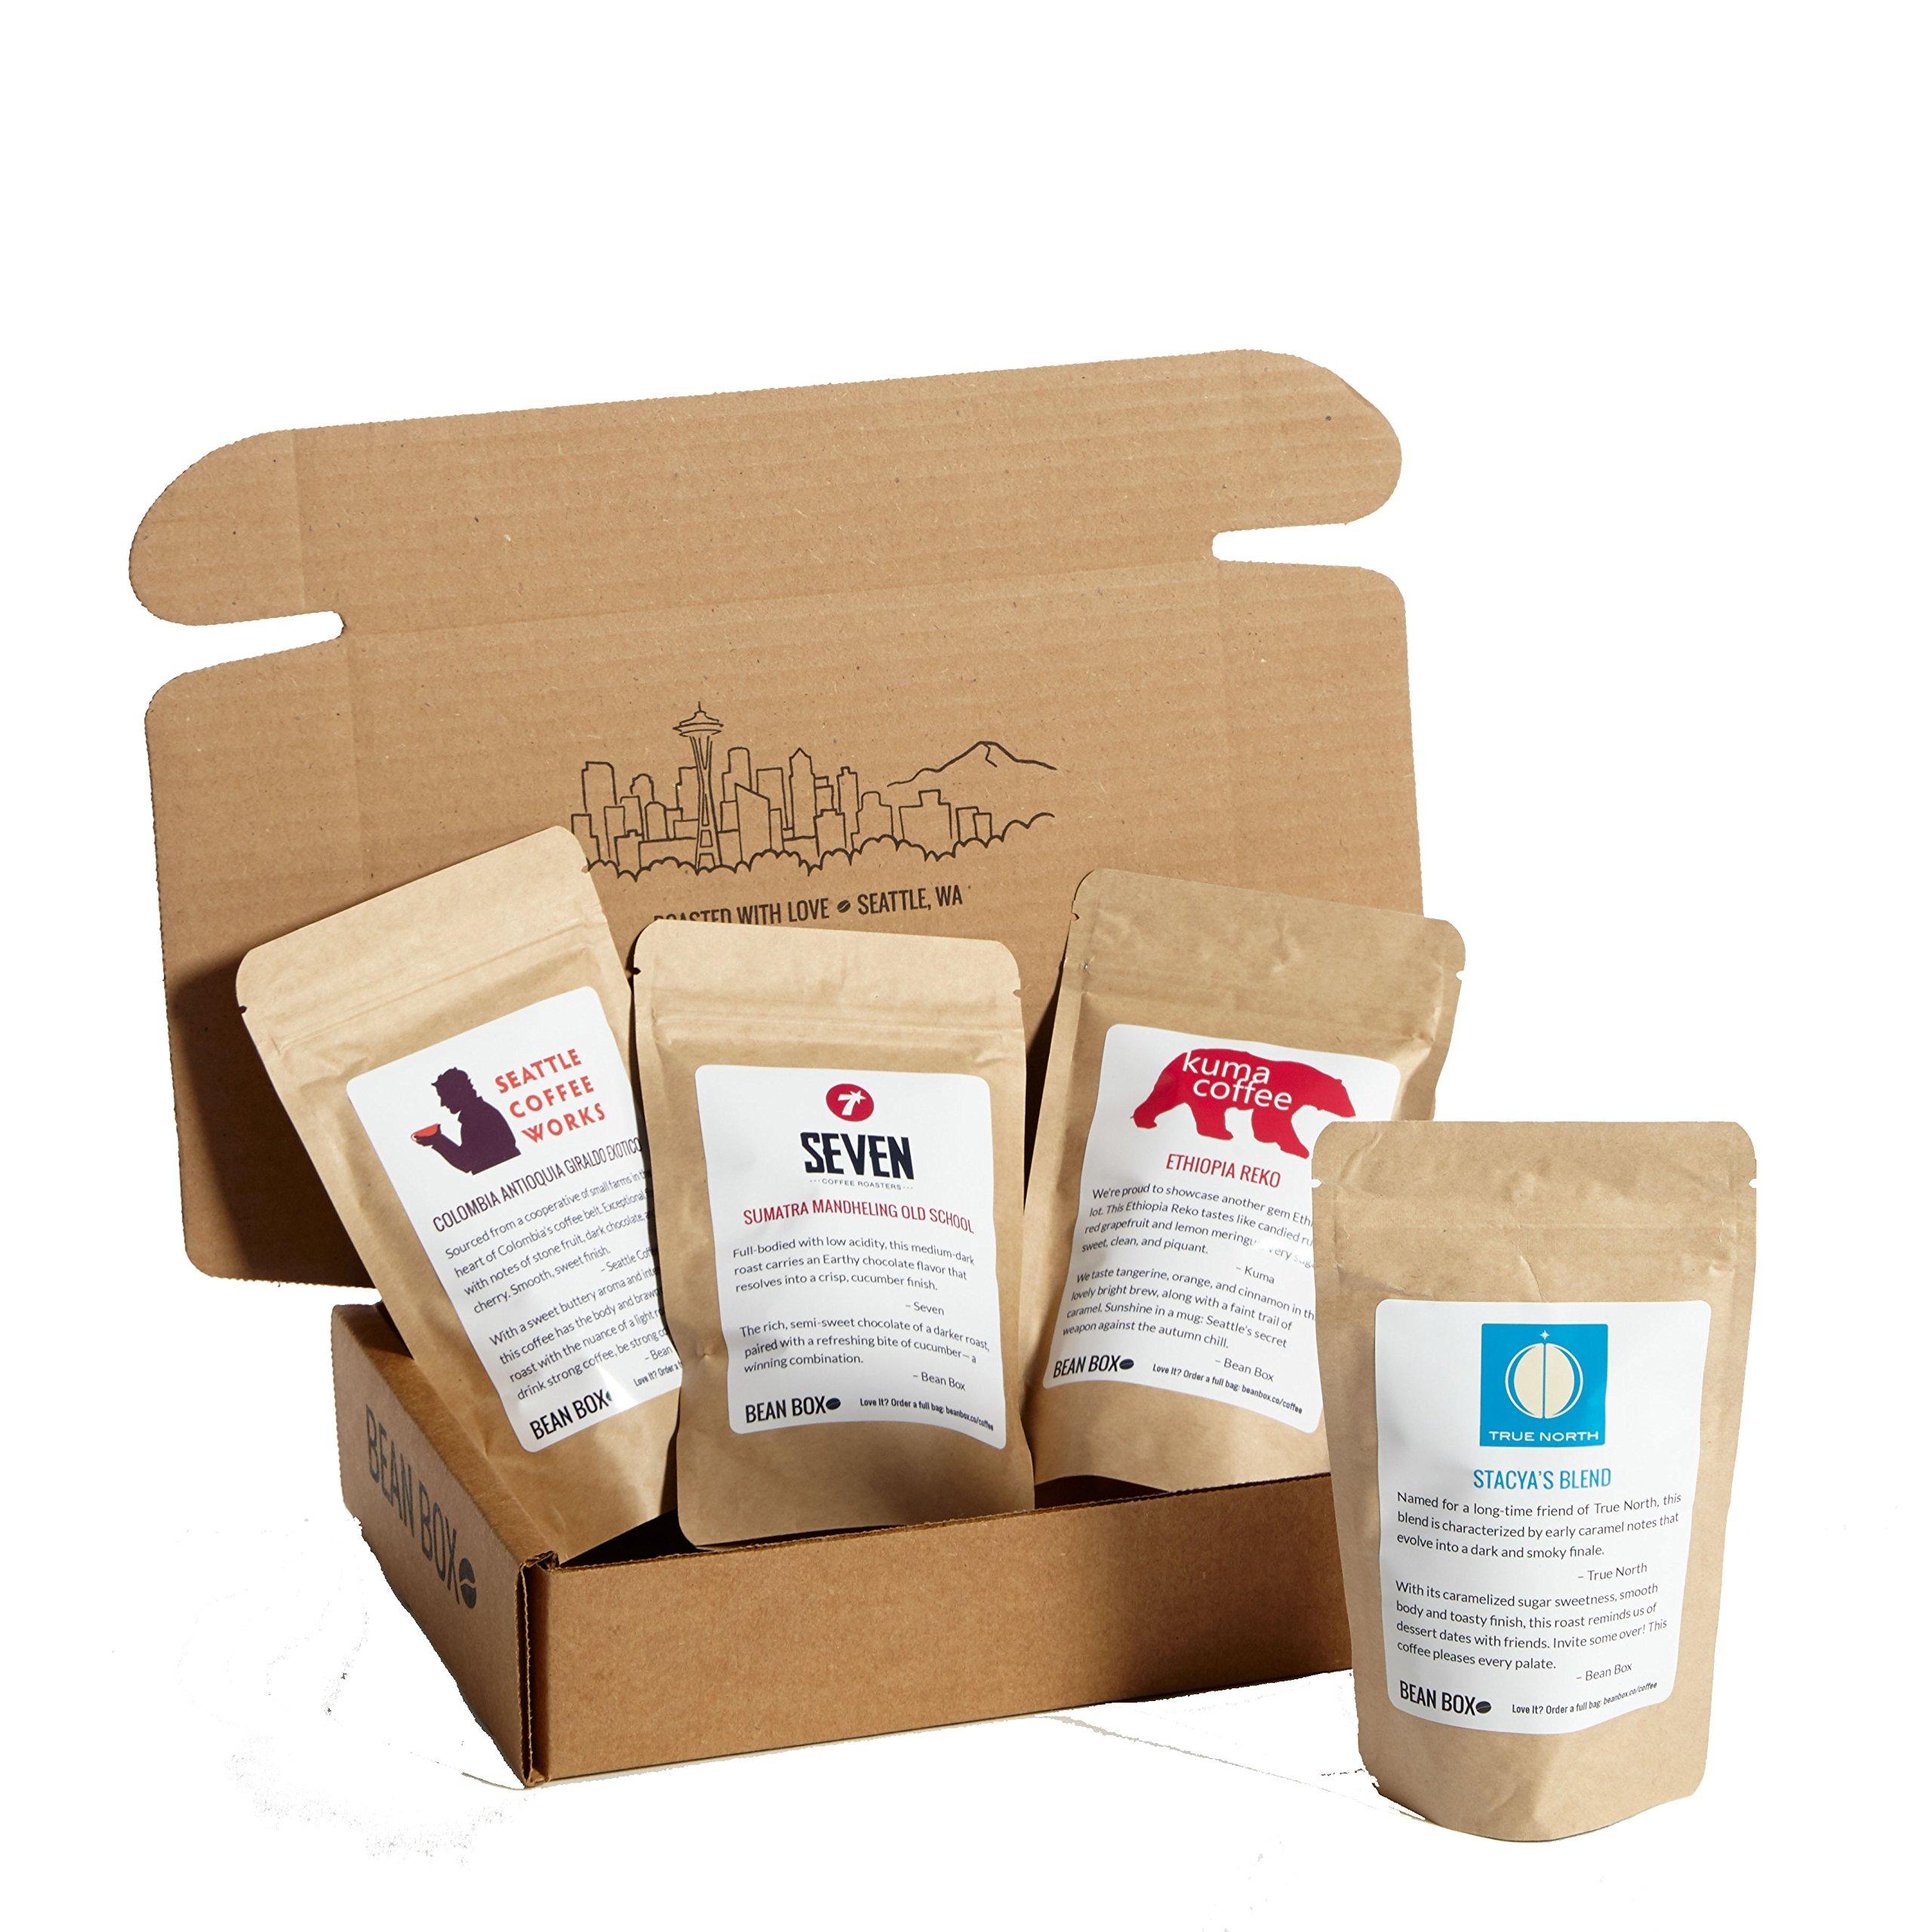 Bean Box Gourmet Coffee Sampler – 3-Month Gift Subscription